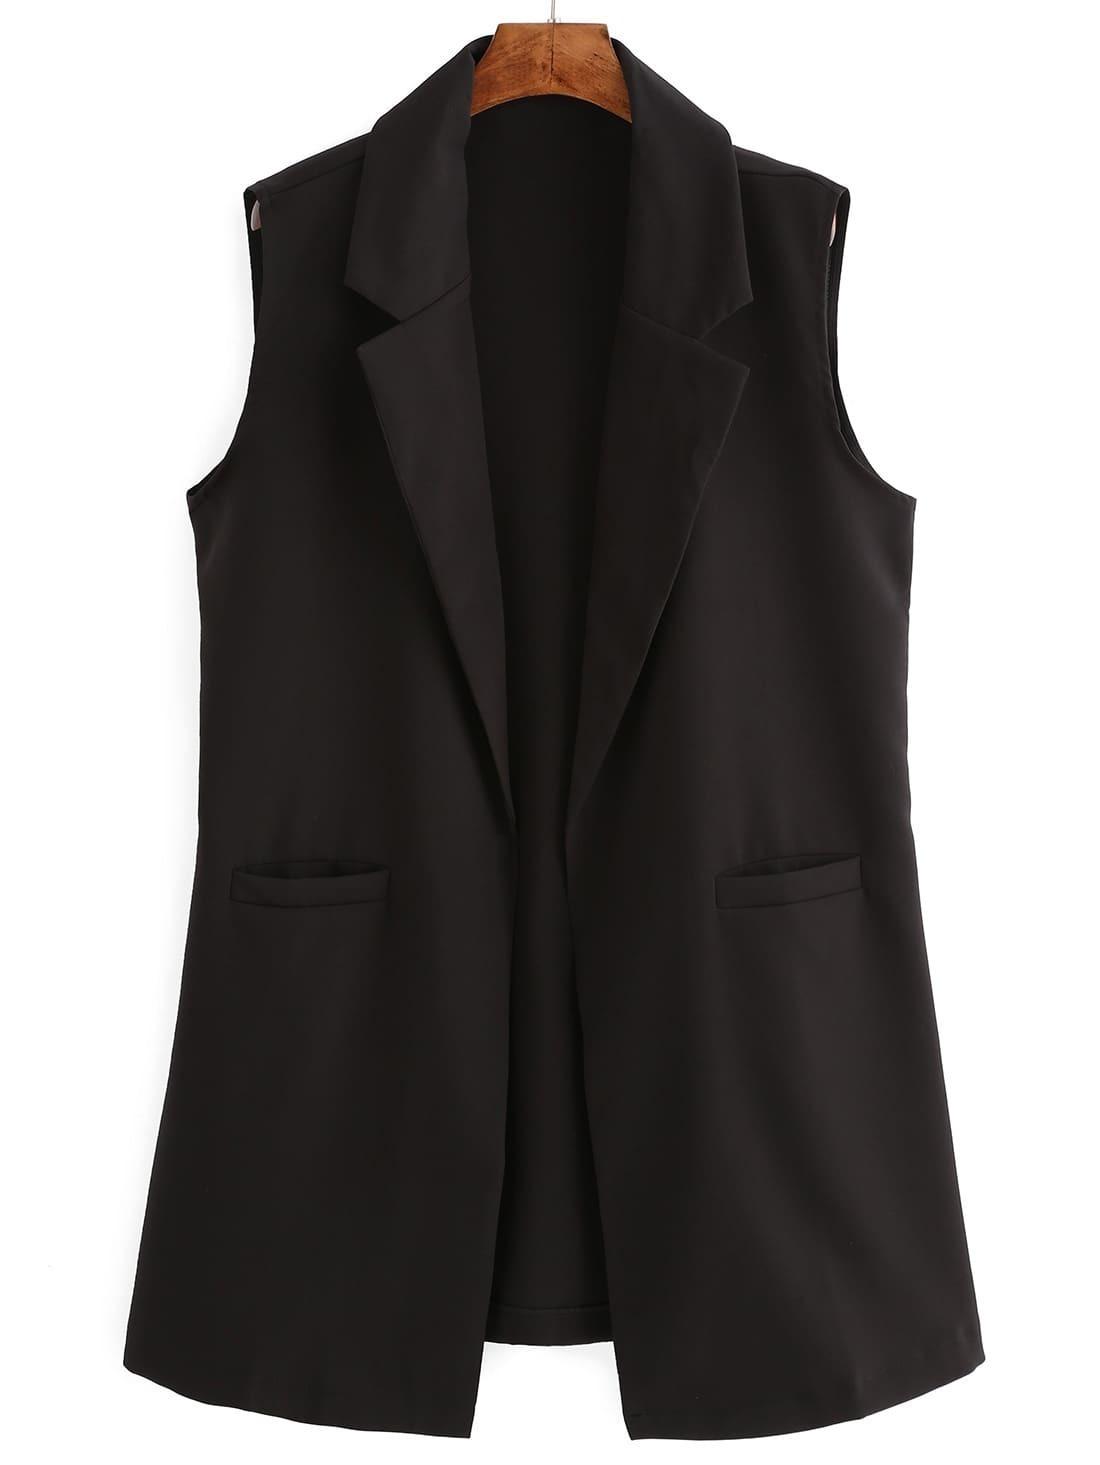 Black Notch Lapel Sleeveless Fitted Blazer